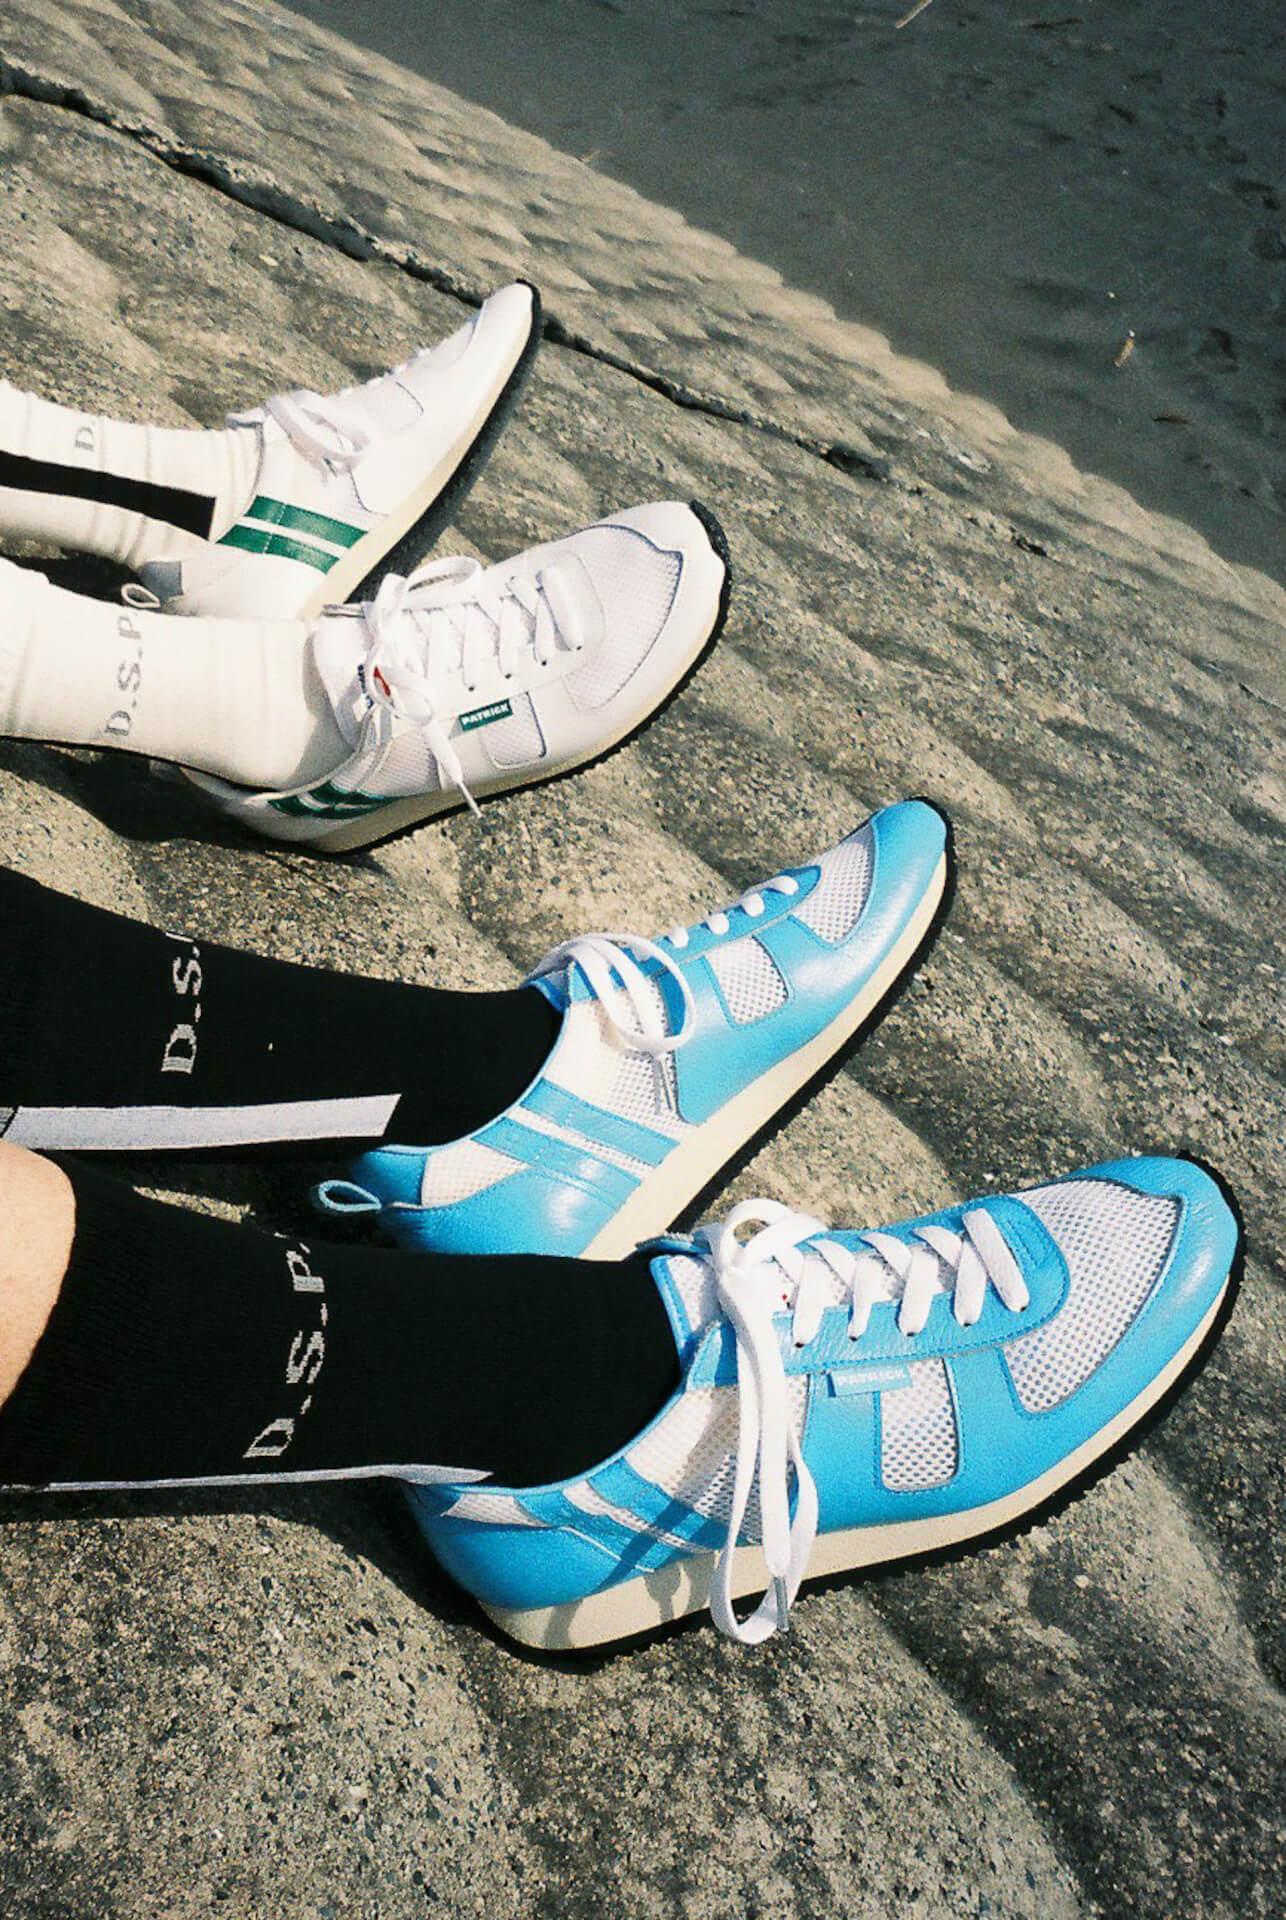 Diaspora skateboardsがフランス発祥のシューズブランド・PATRICKとのカプセルコレクションを明日販売開始! fashion210423_diasporaskateboards-08